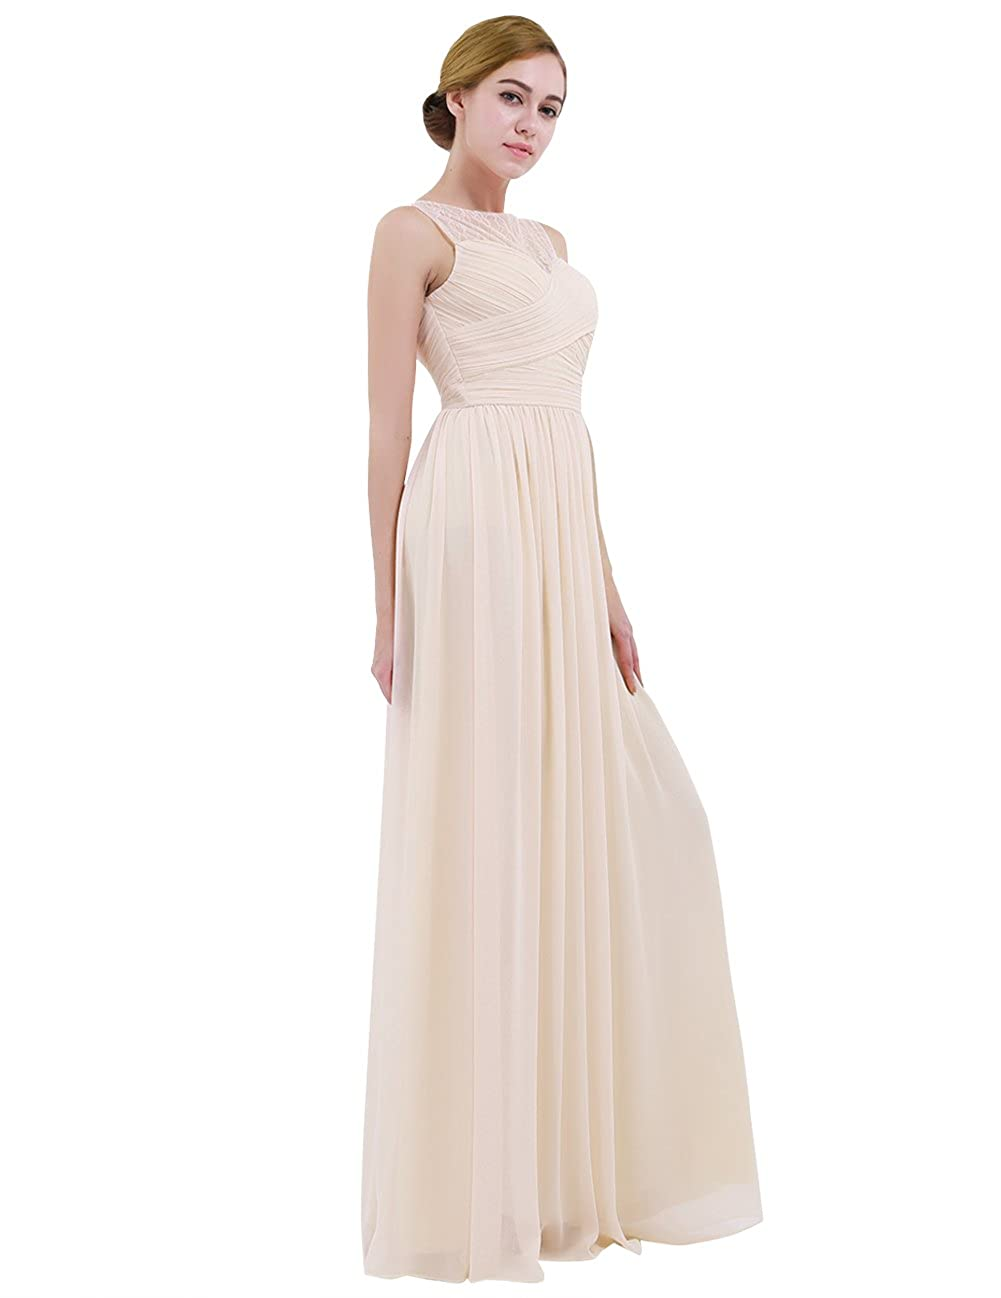 e4a33392de7640 iEFiEL Women Lace Illusion Cross Pleats Bridesmaid Dress Long Evening Prom  Gown at Amazon Women s Clothing store